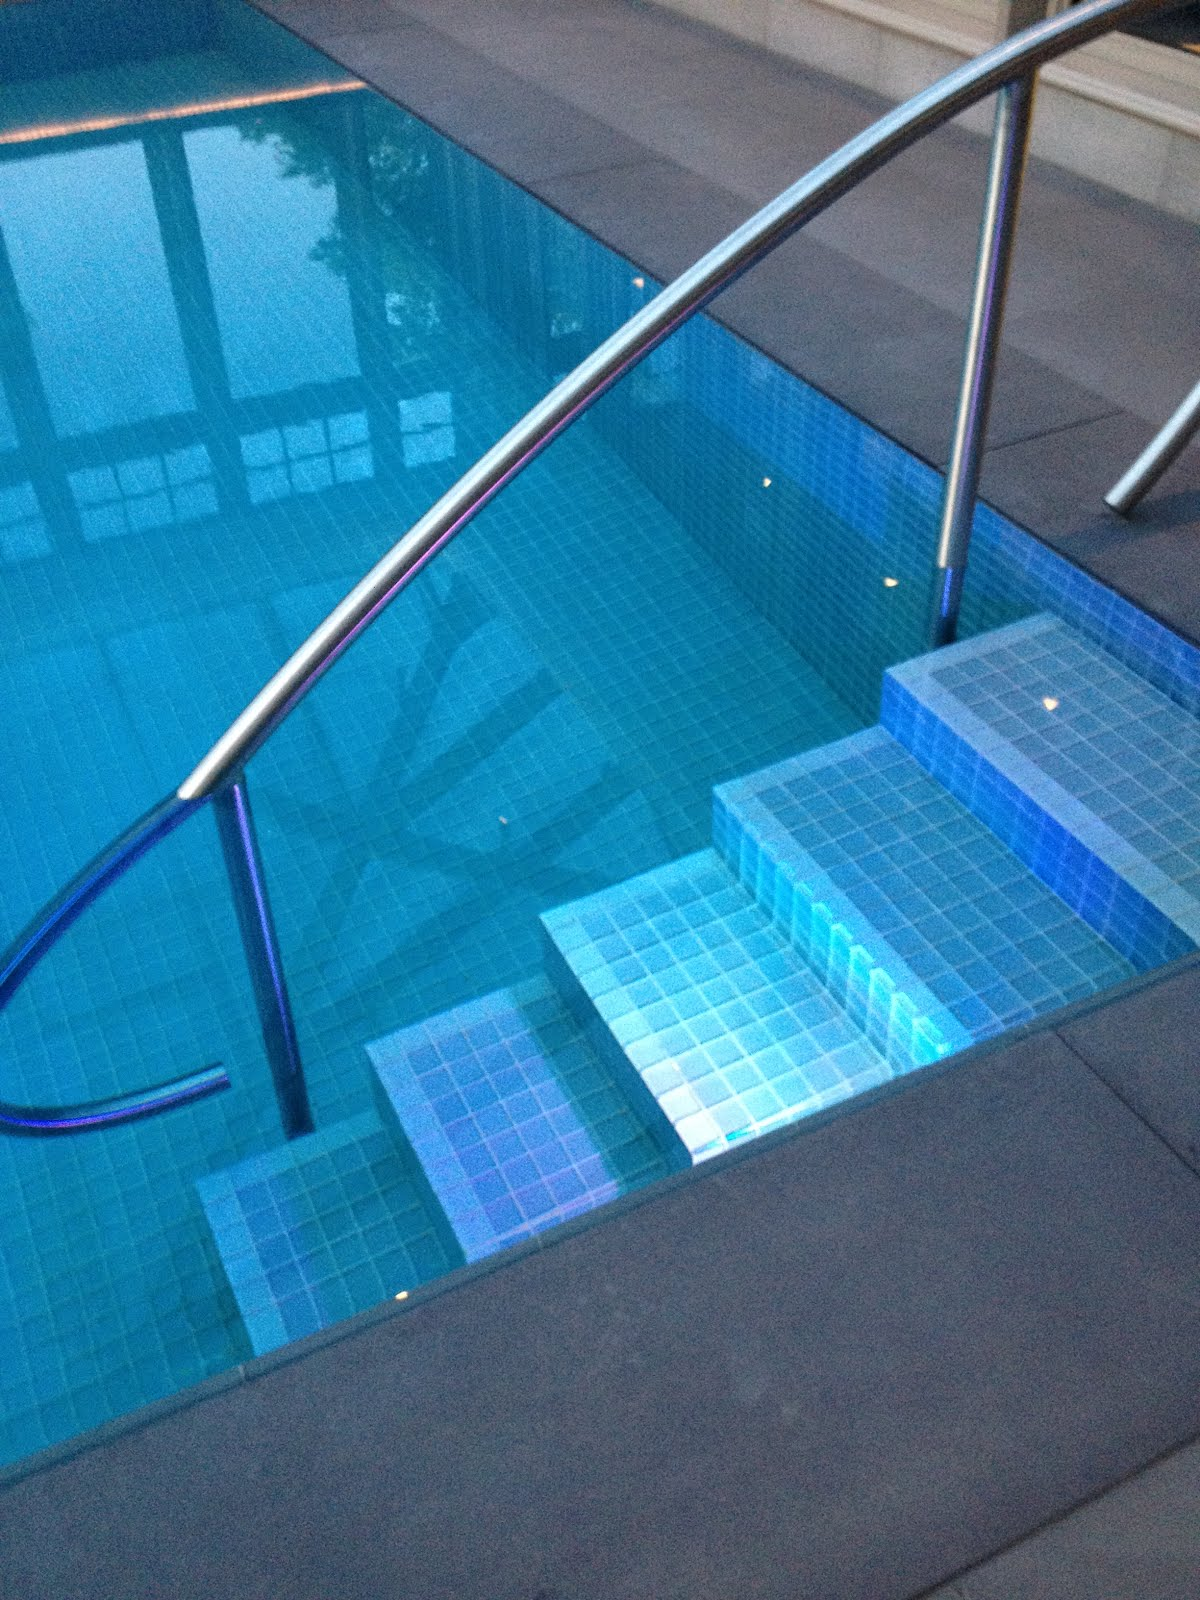 Aquaknot Pools Inc Knife Edge Perimeter Overflow Pool